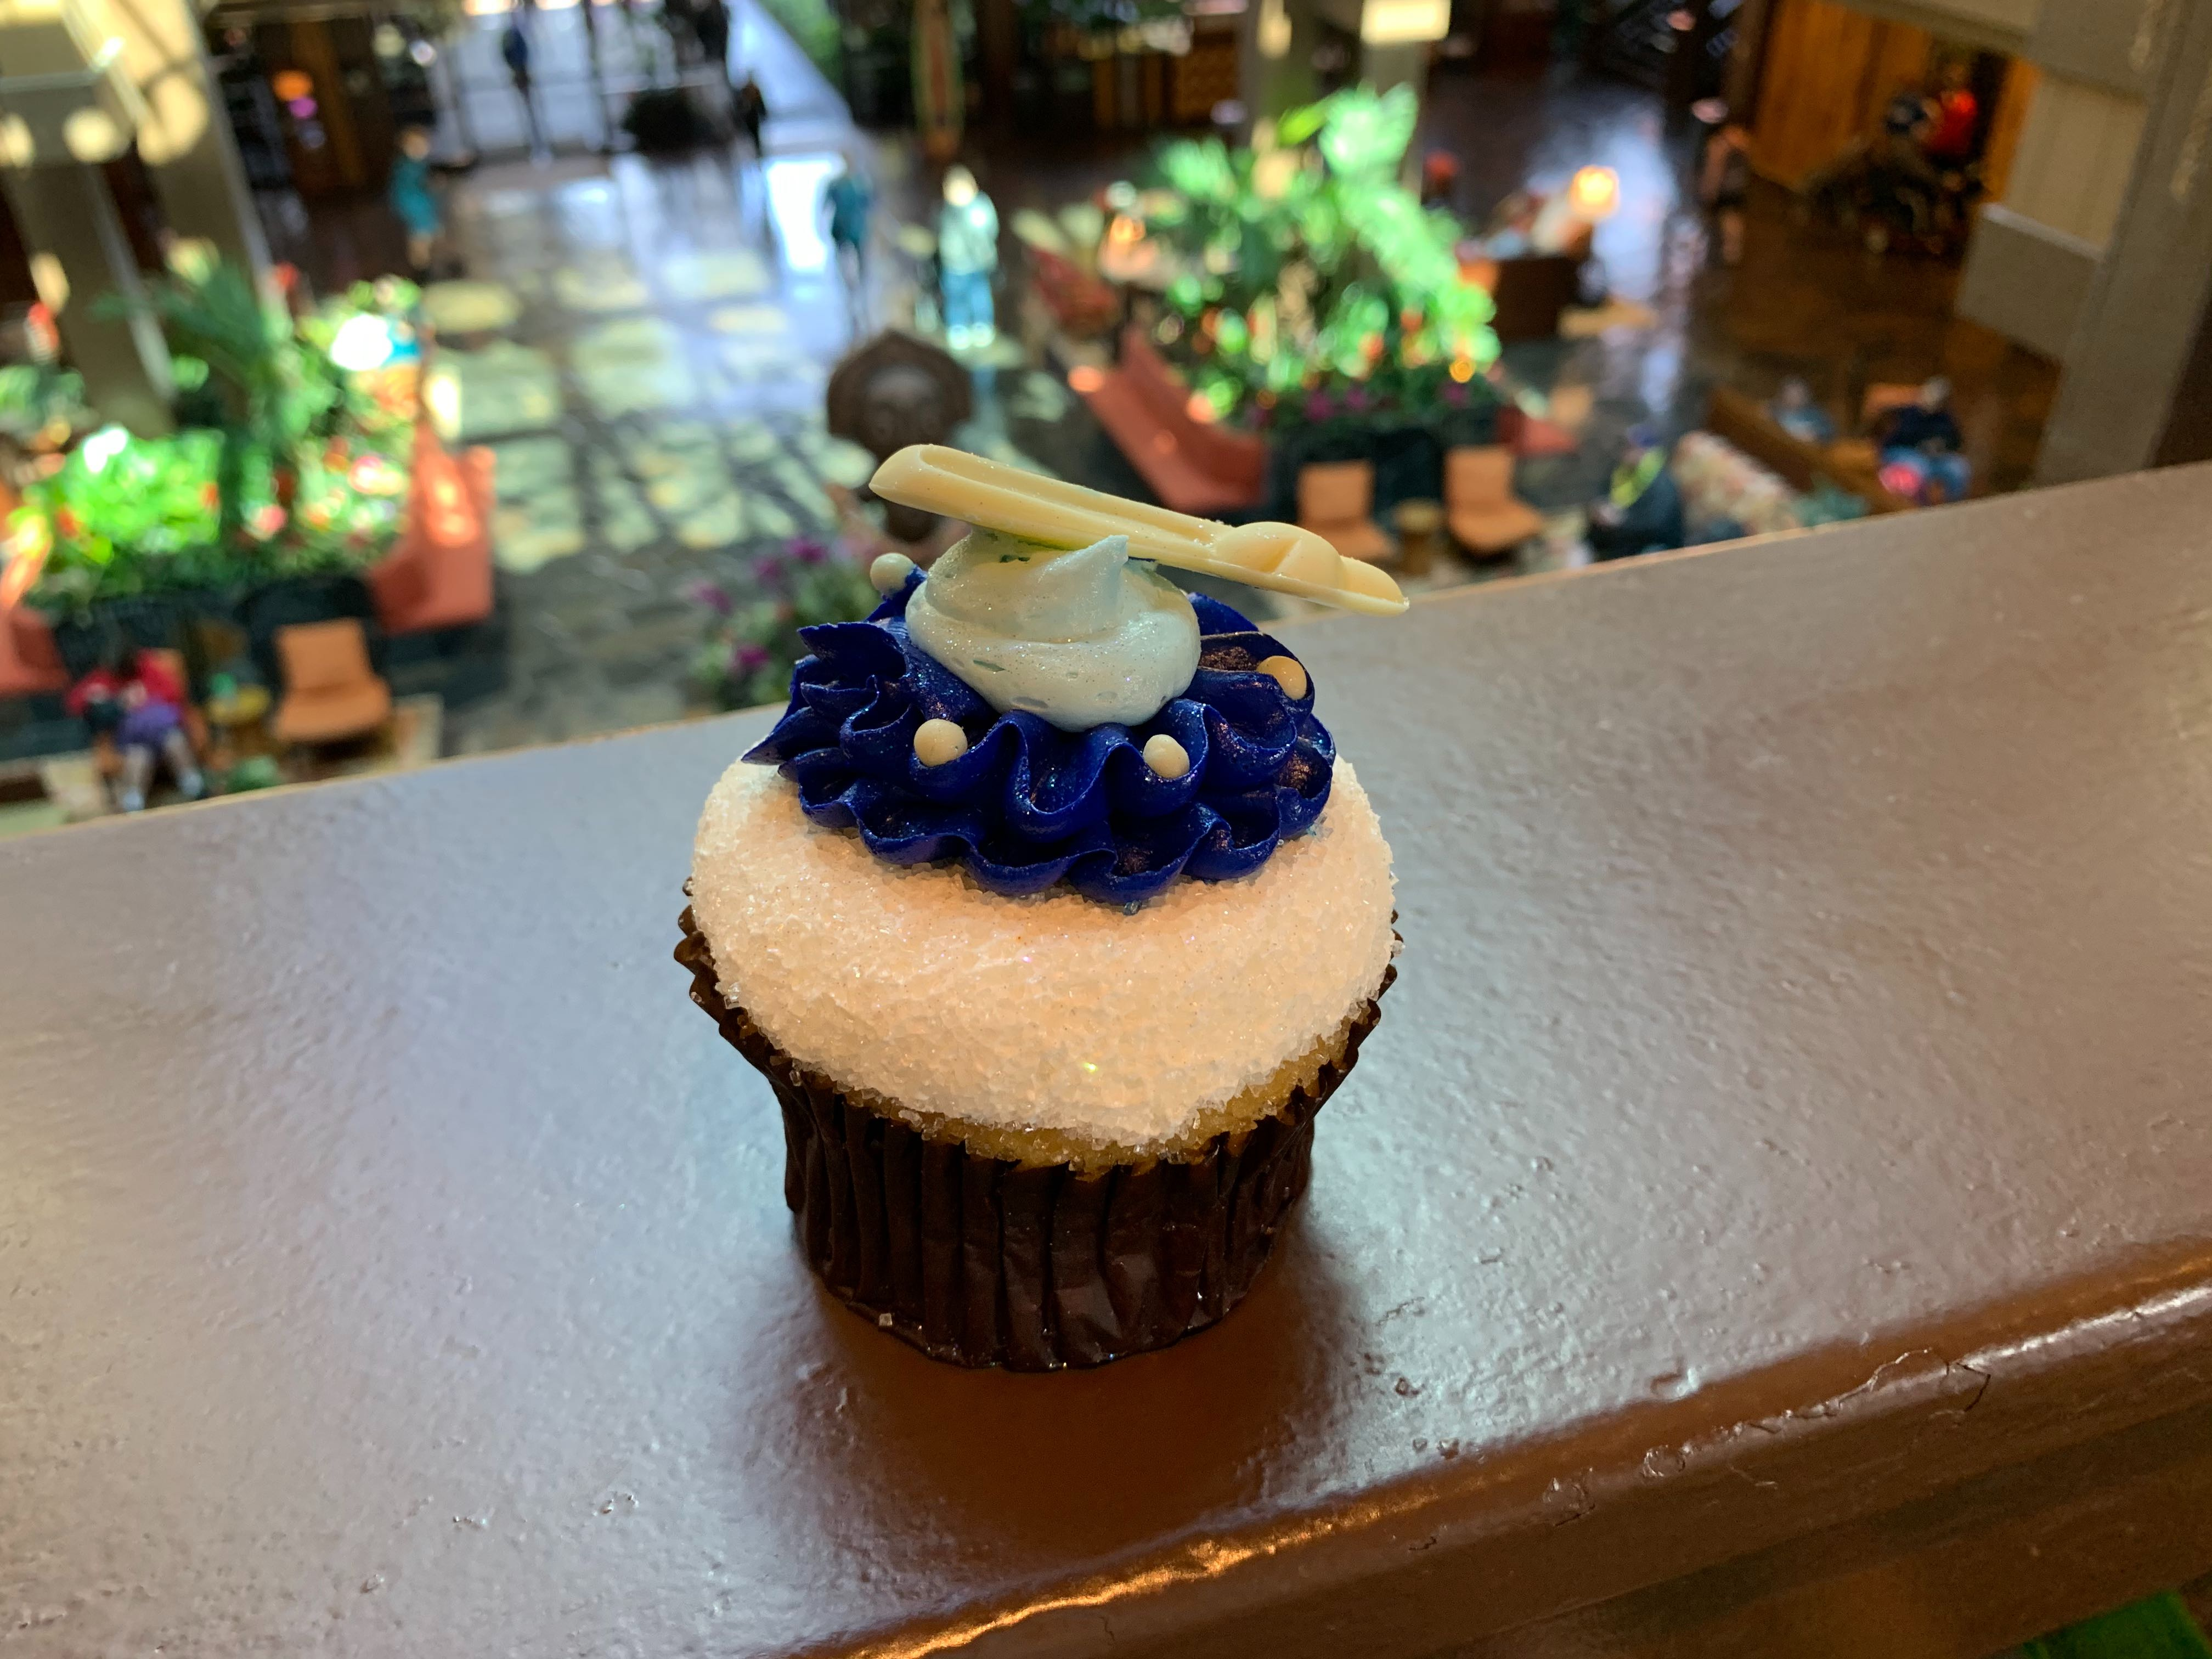 cinderella-cupcake-polynesian-poly-02-02-2020-3.jpg